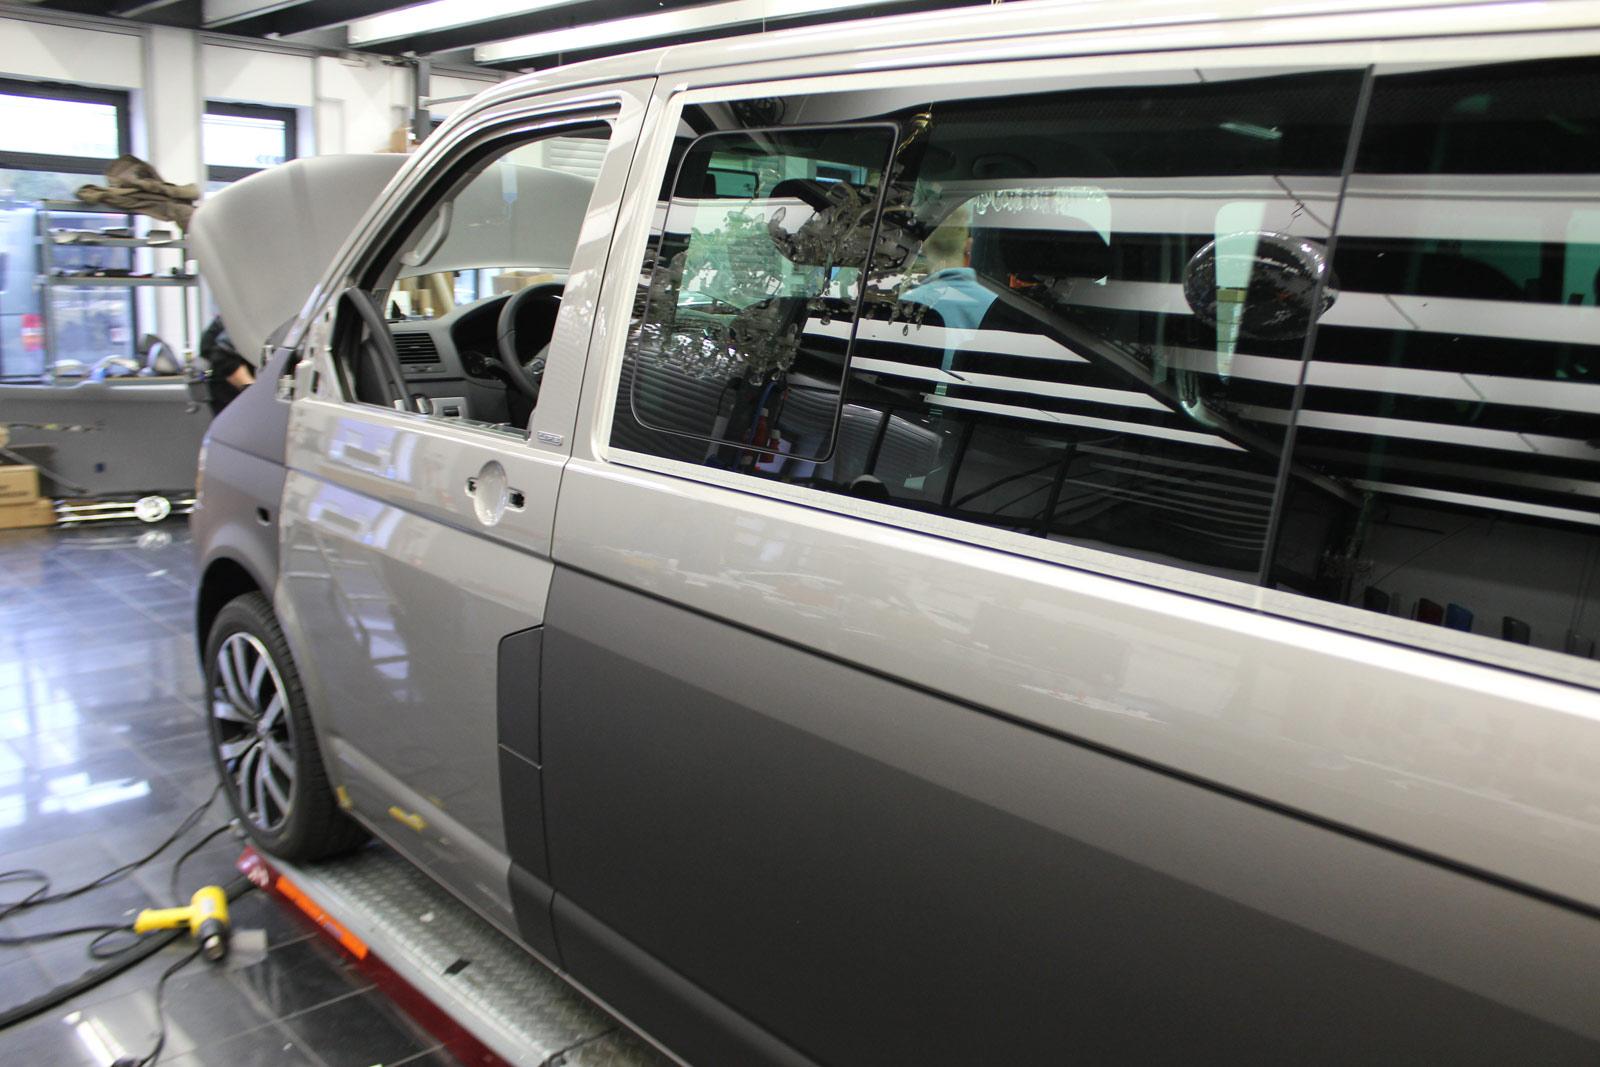 VW_T5_MULTIVAN_FAHRRADHALTERUNG_SCHUTZ_CHARCOAL_METALLIC_MATT_02